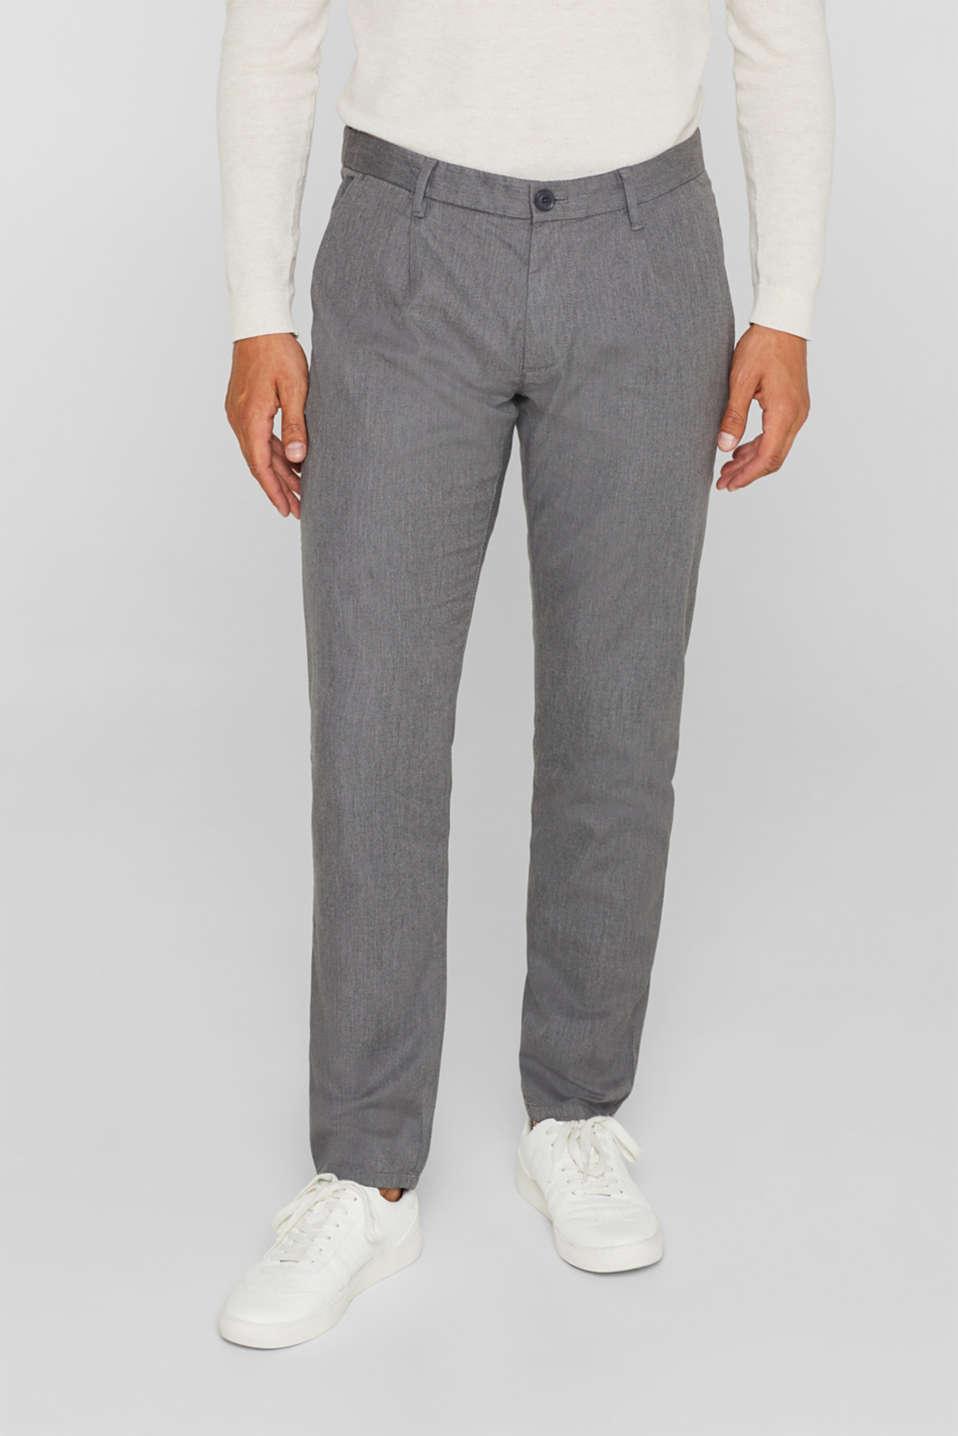 Pants woven Slim fit, GREY, detail image number 0